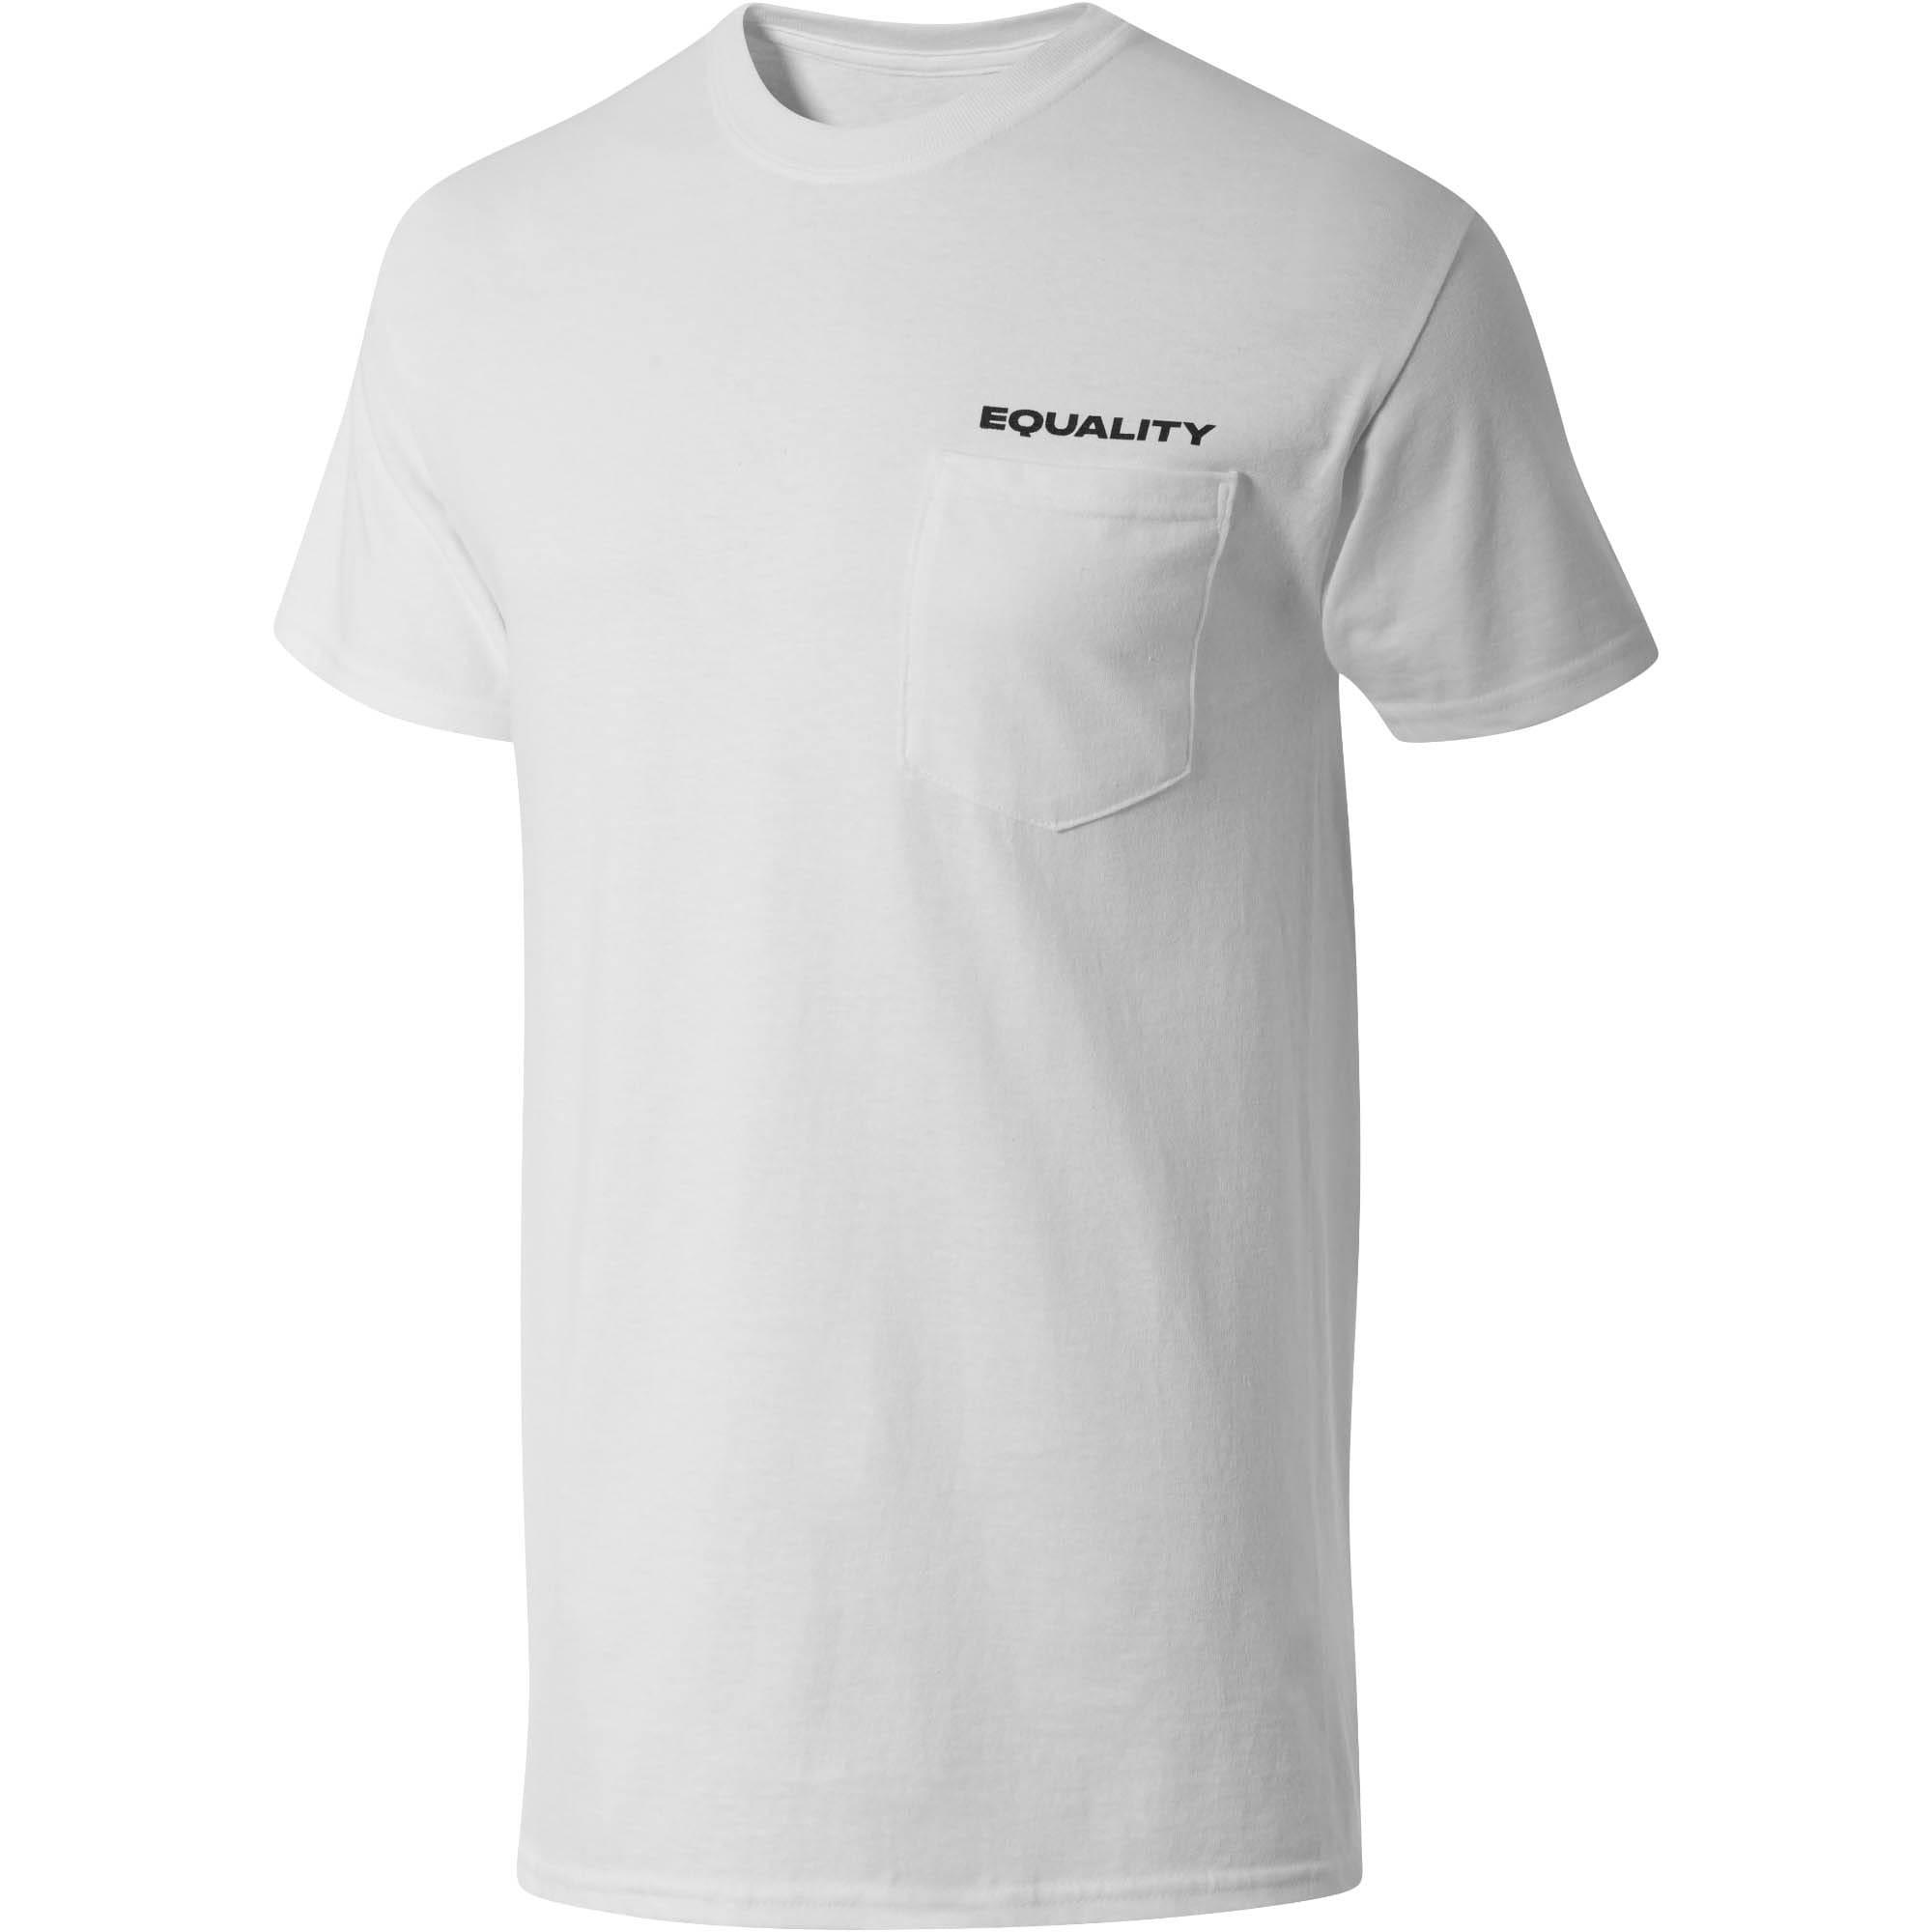 Thumbnail 1 of PUMA Equality x MIA x Josh Vides Men's Classic Short Sleeve T-Shirt with Pocket, White, medium